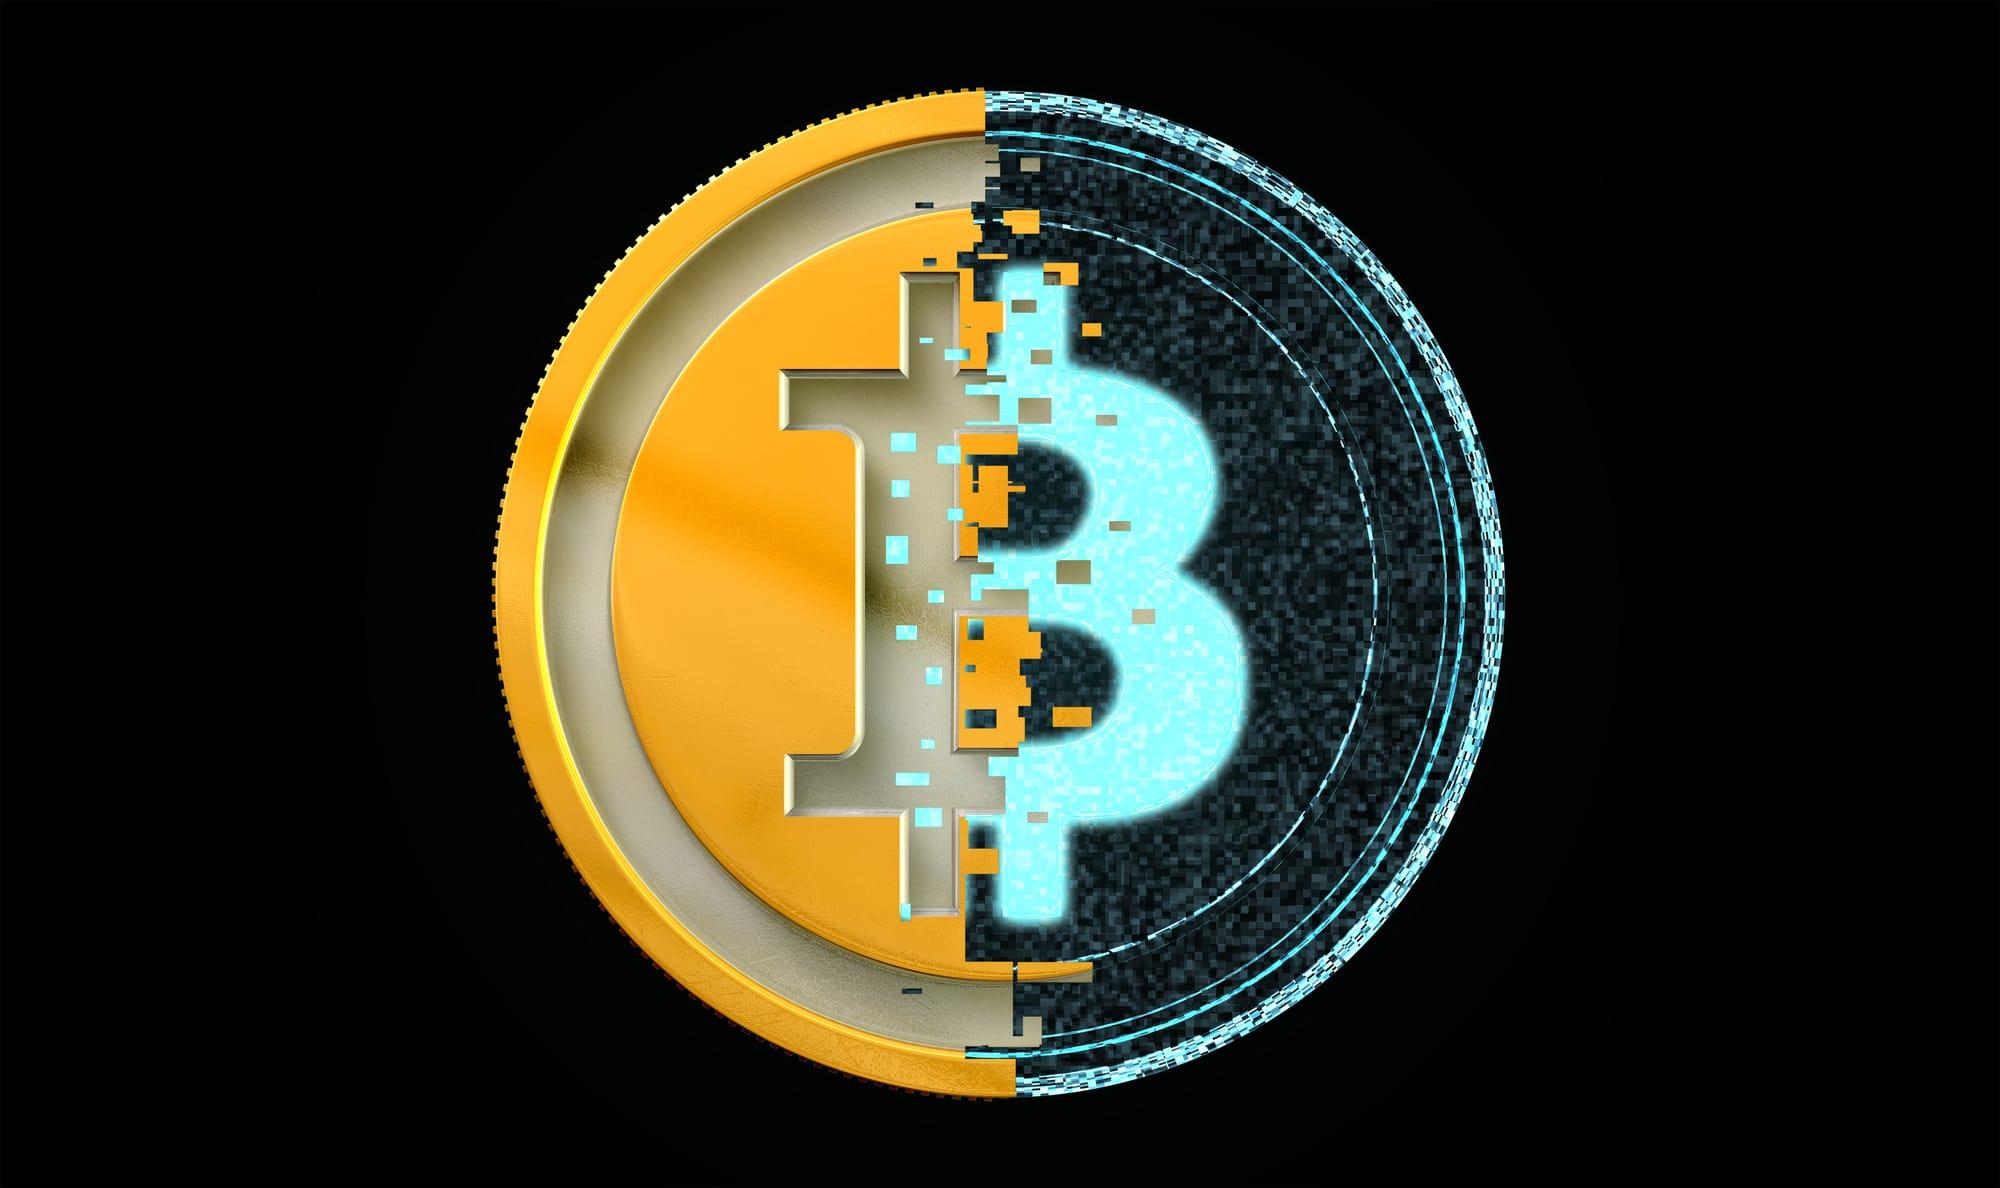 Bitcoin crolla sotto i 30 mila dollari: il mercato cripto oscilla vertiginosamente thumbnail